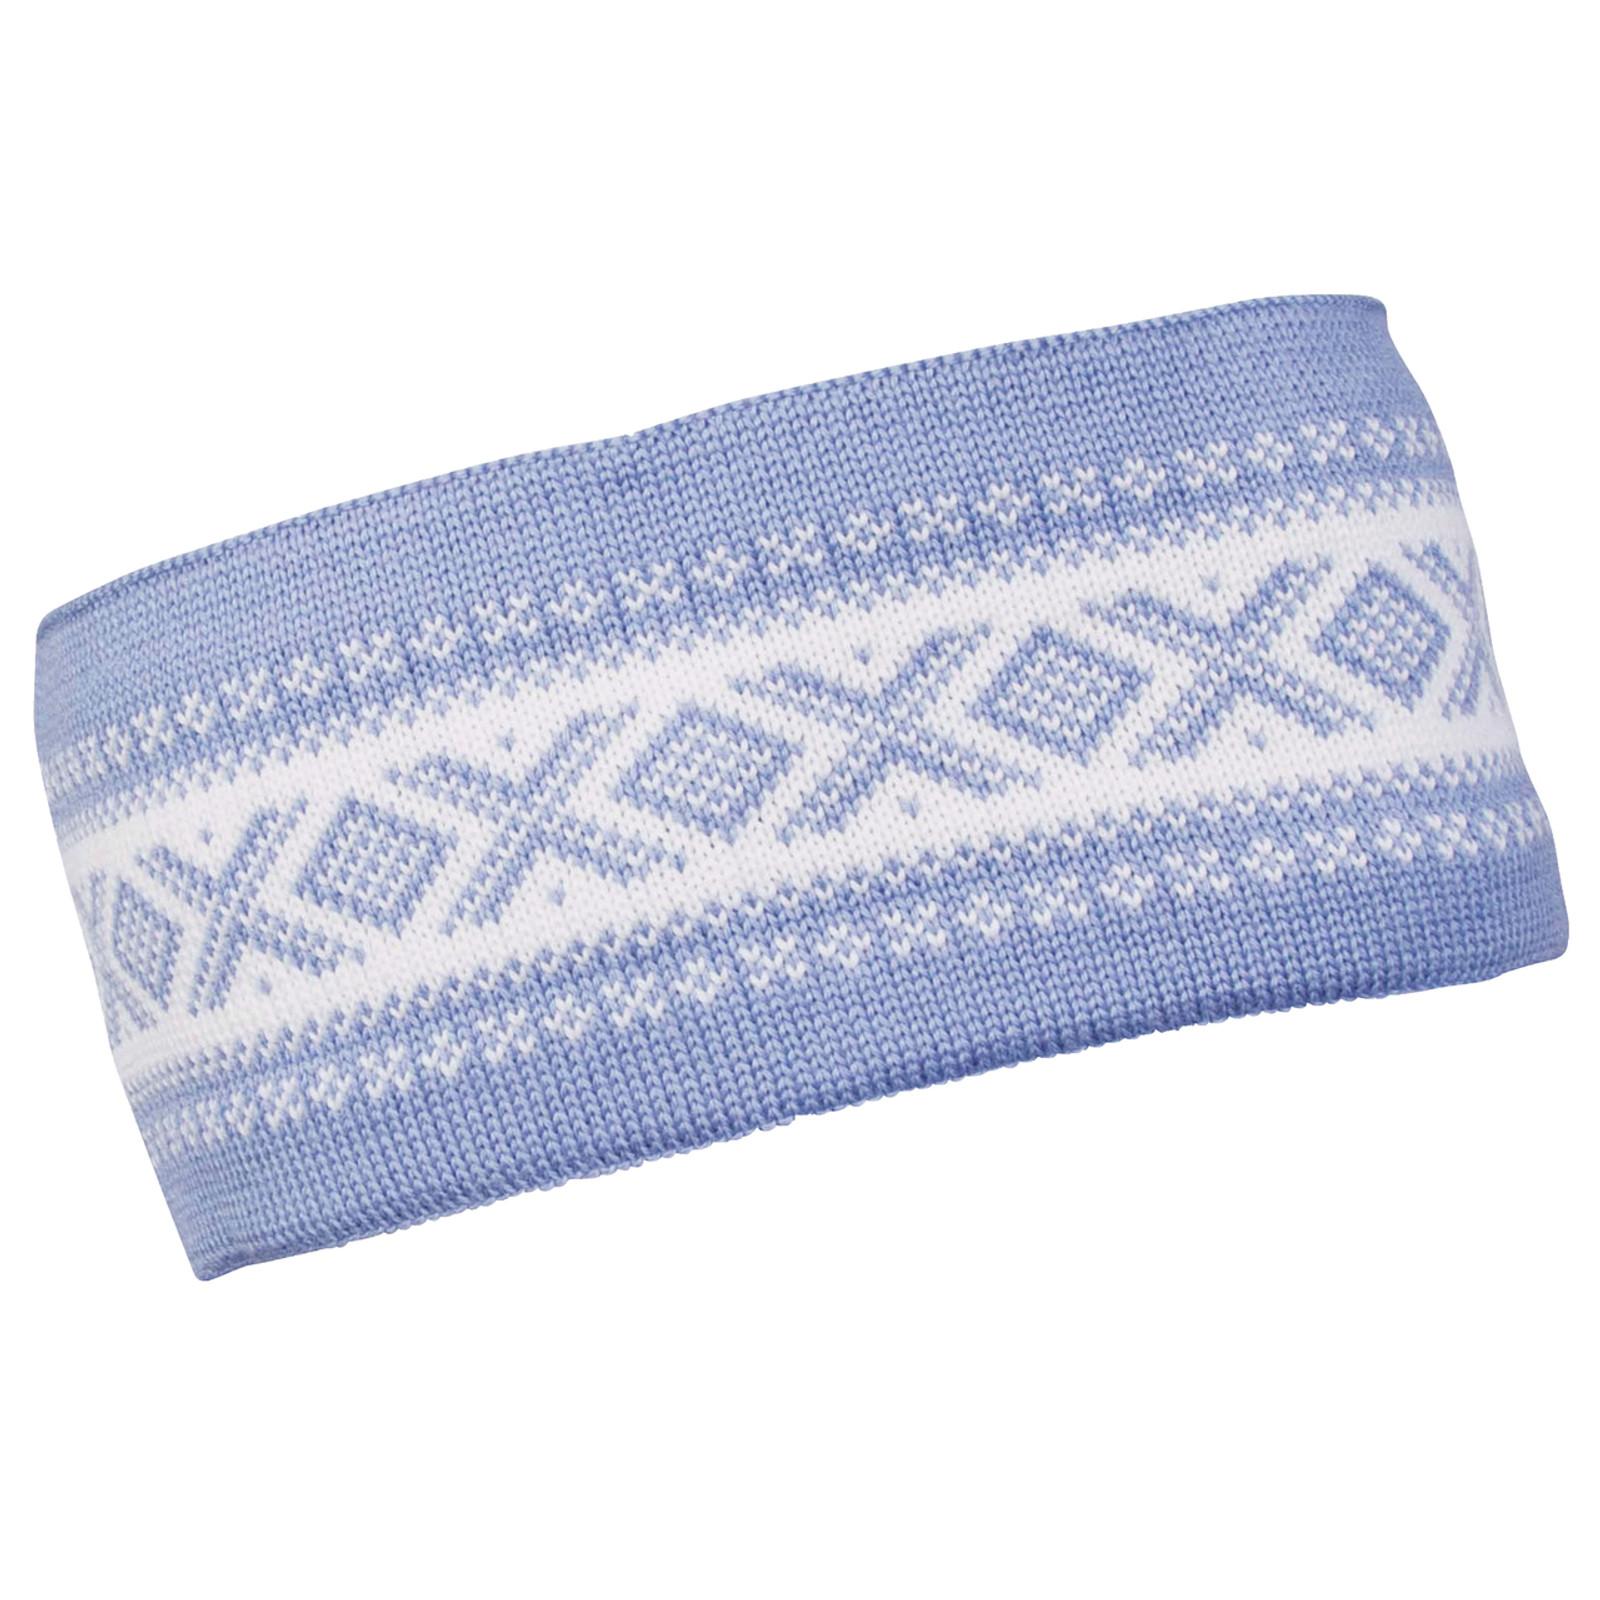 Dale of Norway Cortina Merino headband, Blue Shadow/Off-White, 26021-D